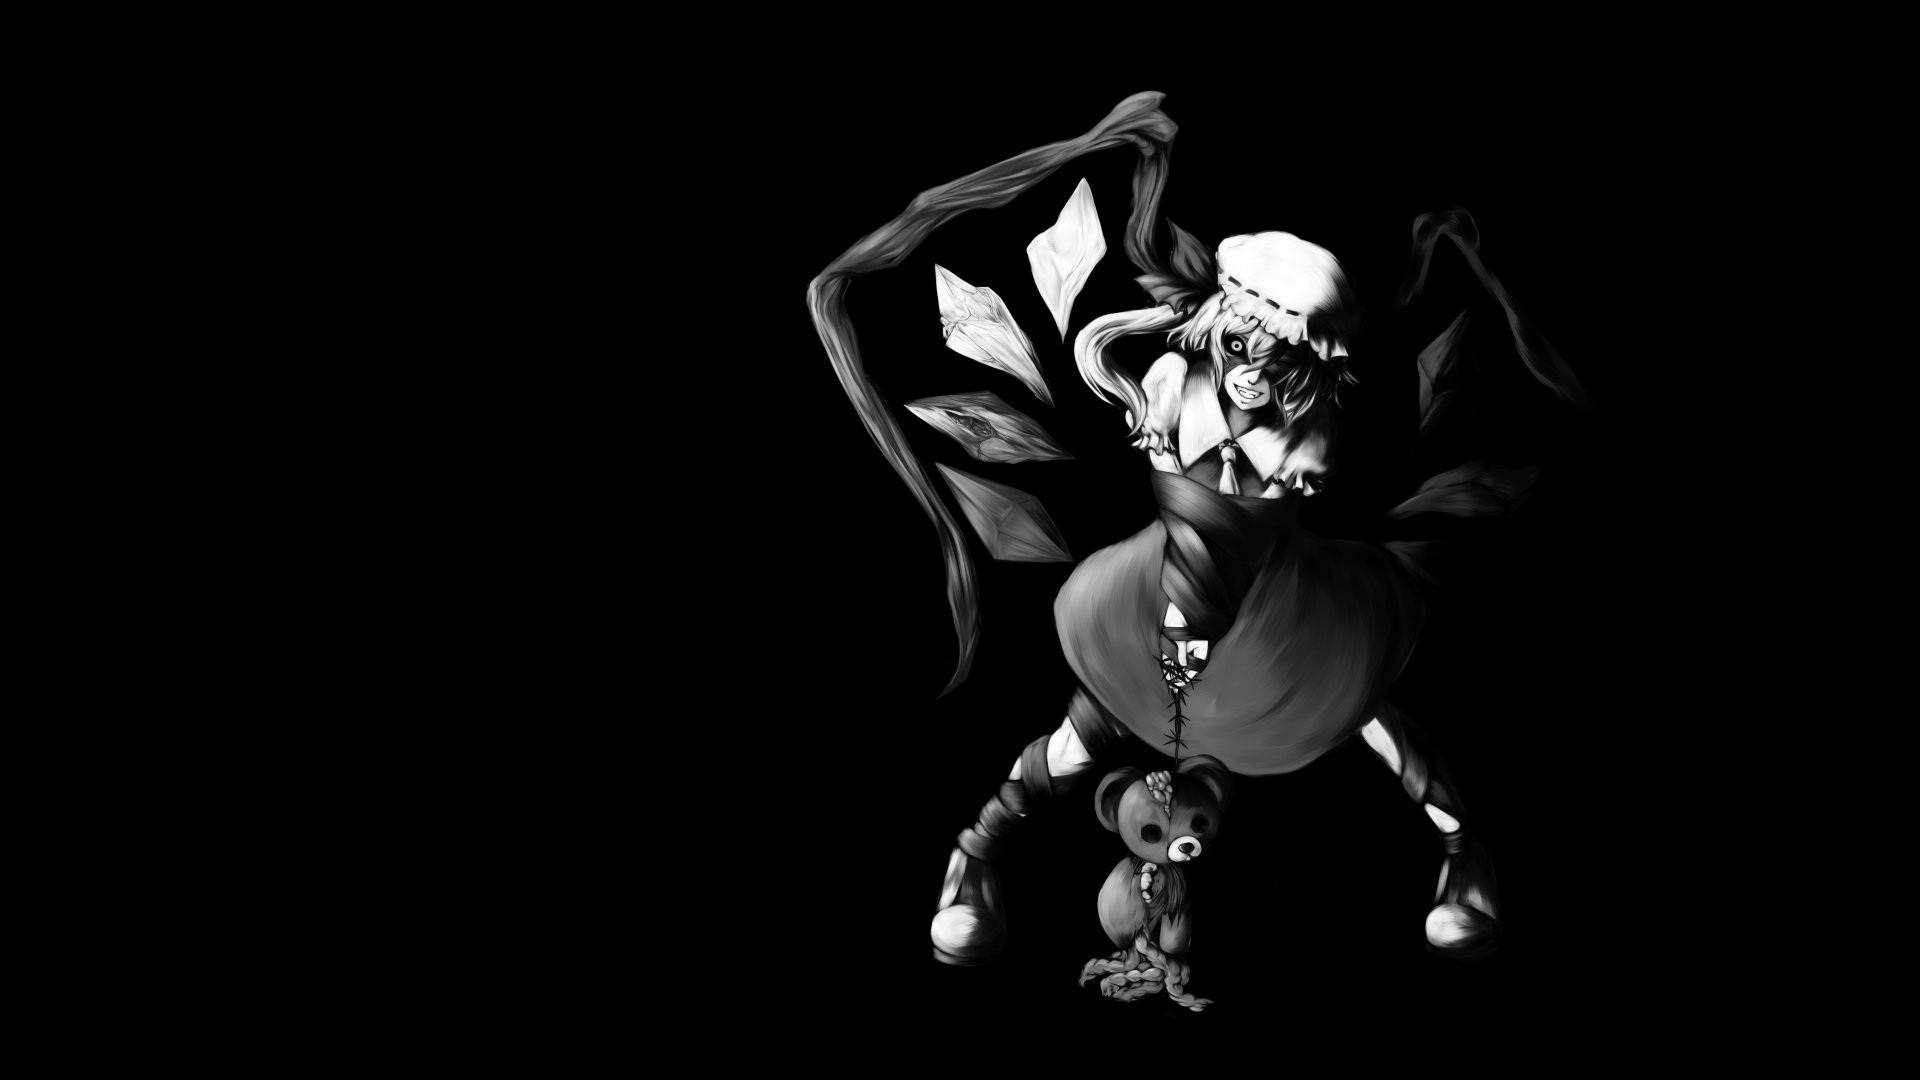 black background 1920x1200 - photo #34